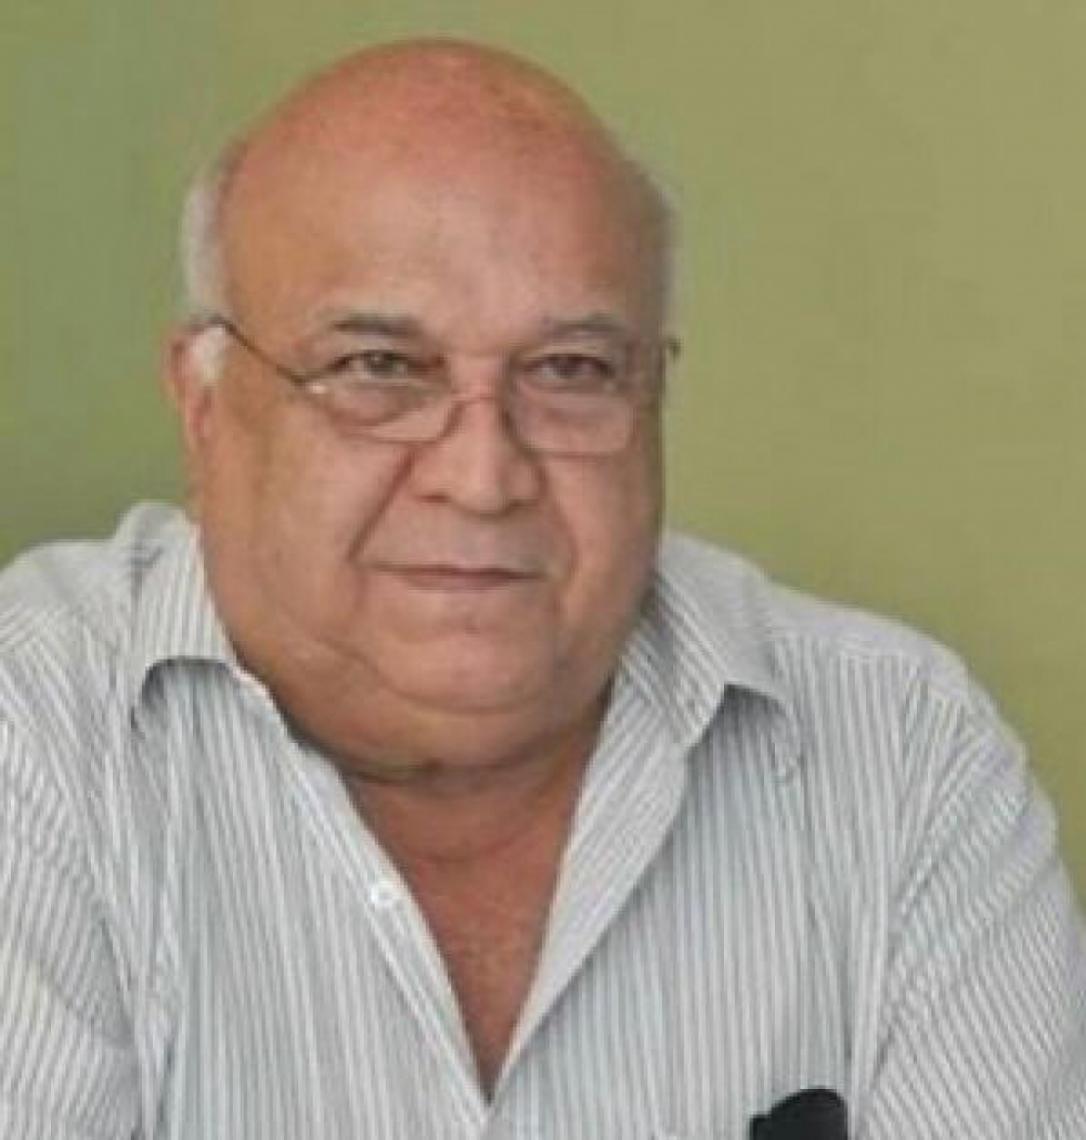 Fernando Castelo Branco